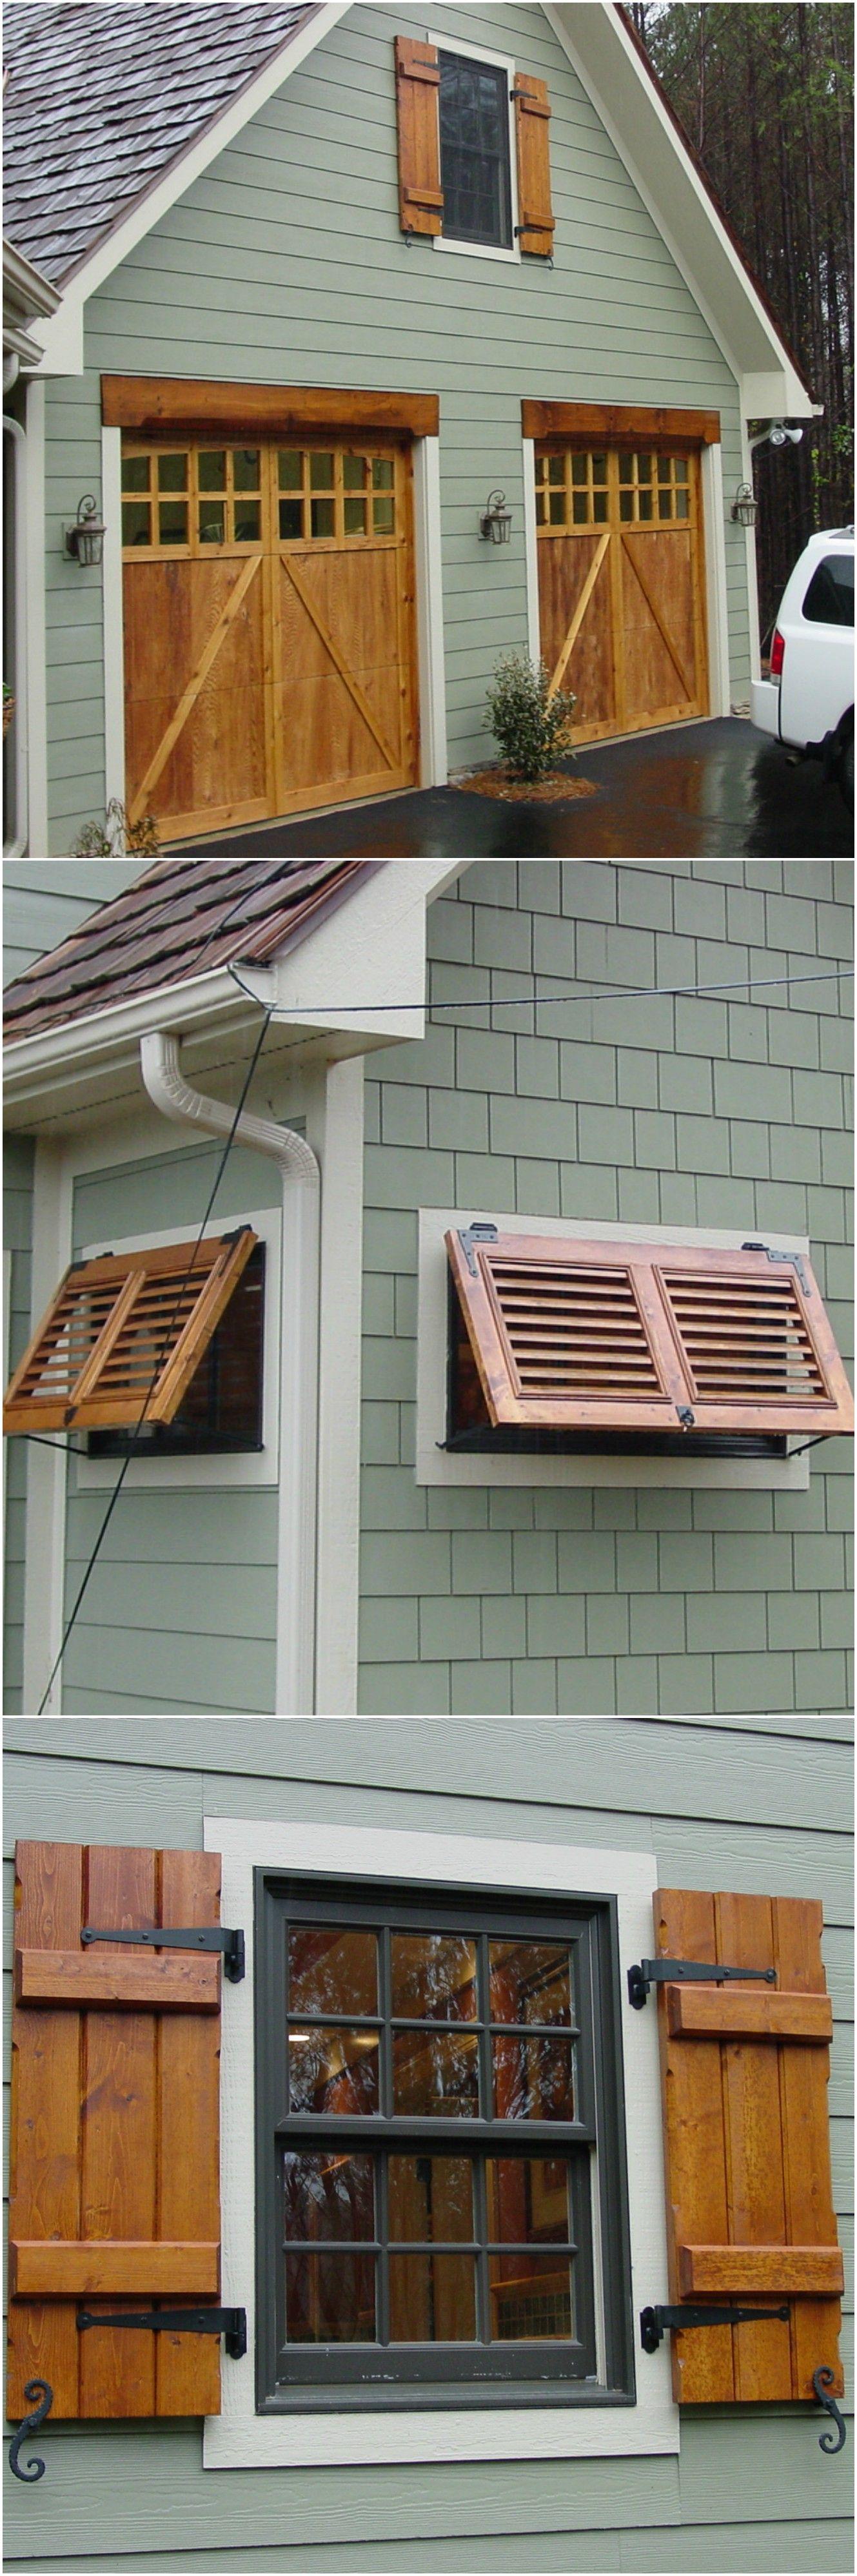 Bay window exterior shutters - Diy Craftsman Exterior Shutters Craftsman Exterior And Exterior Shutters